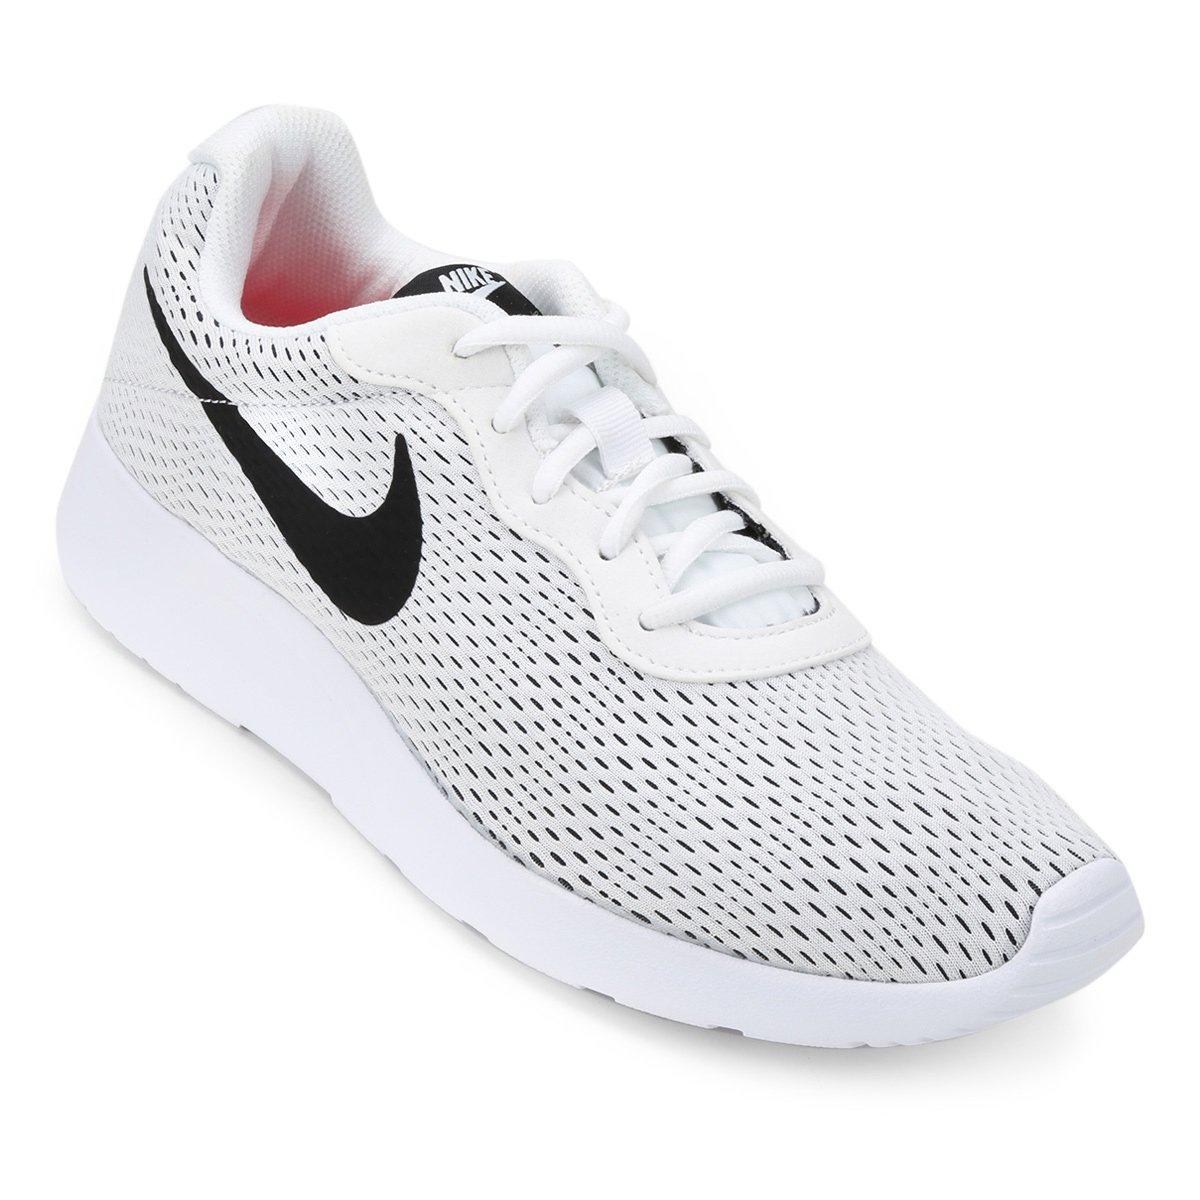 f11898dd1f8 Tênis Nike Tanjun Se Masculino - Compre Agora